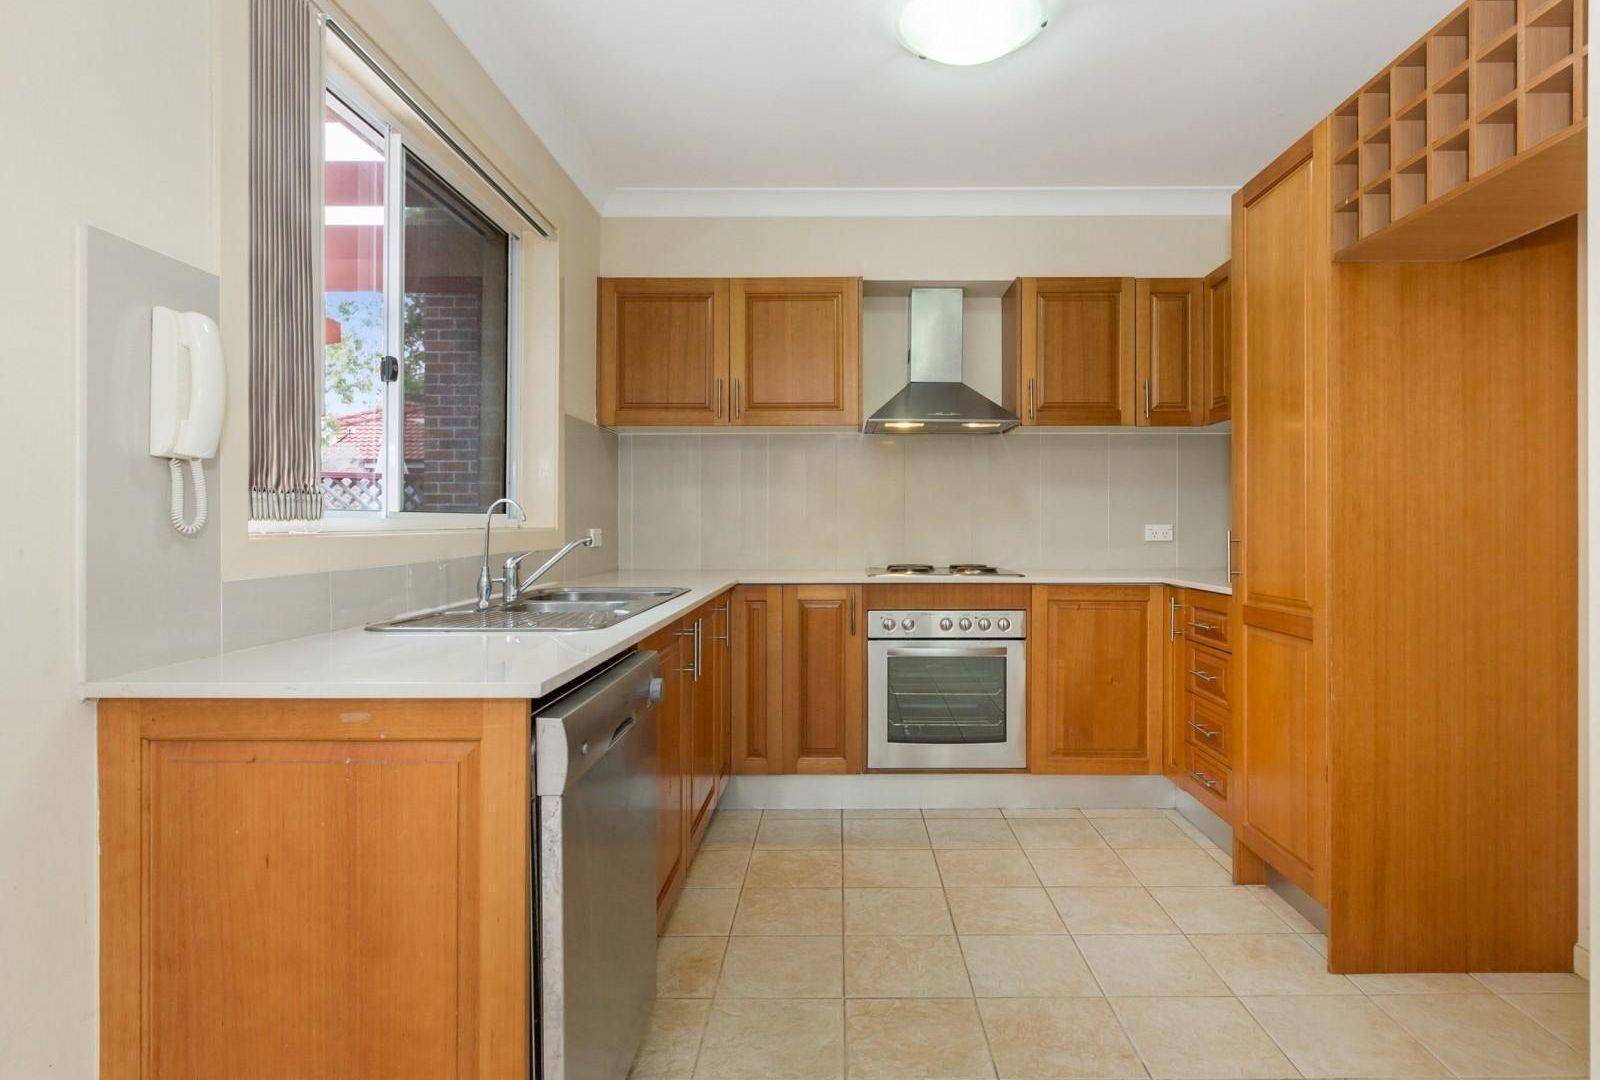 24/1 Rangihou Crescent, Parramatta NSW 2150, Image 2